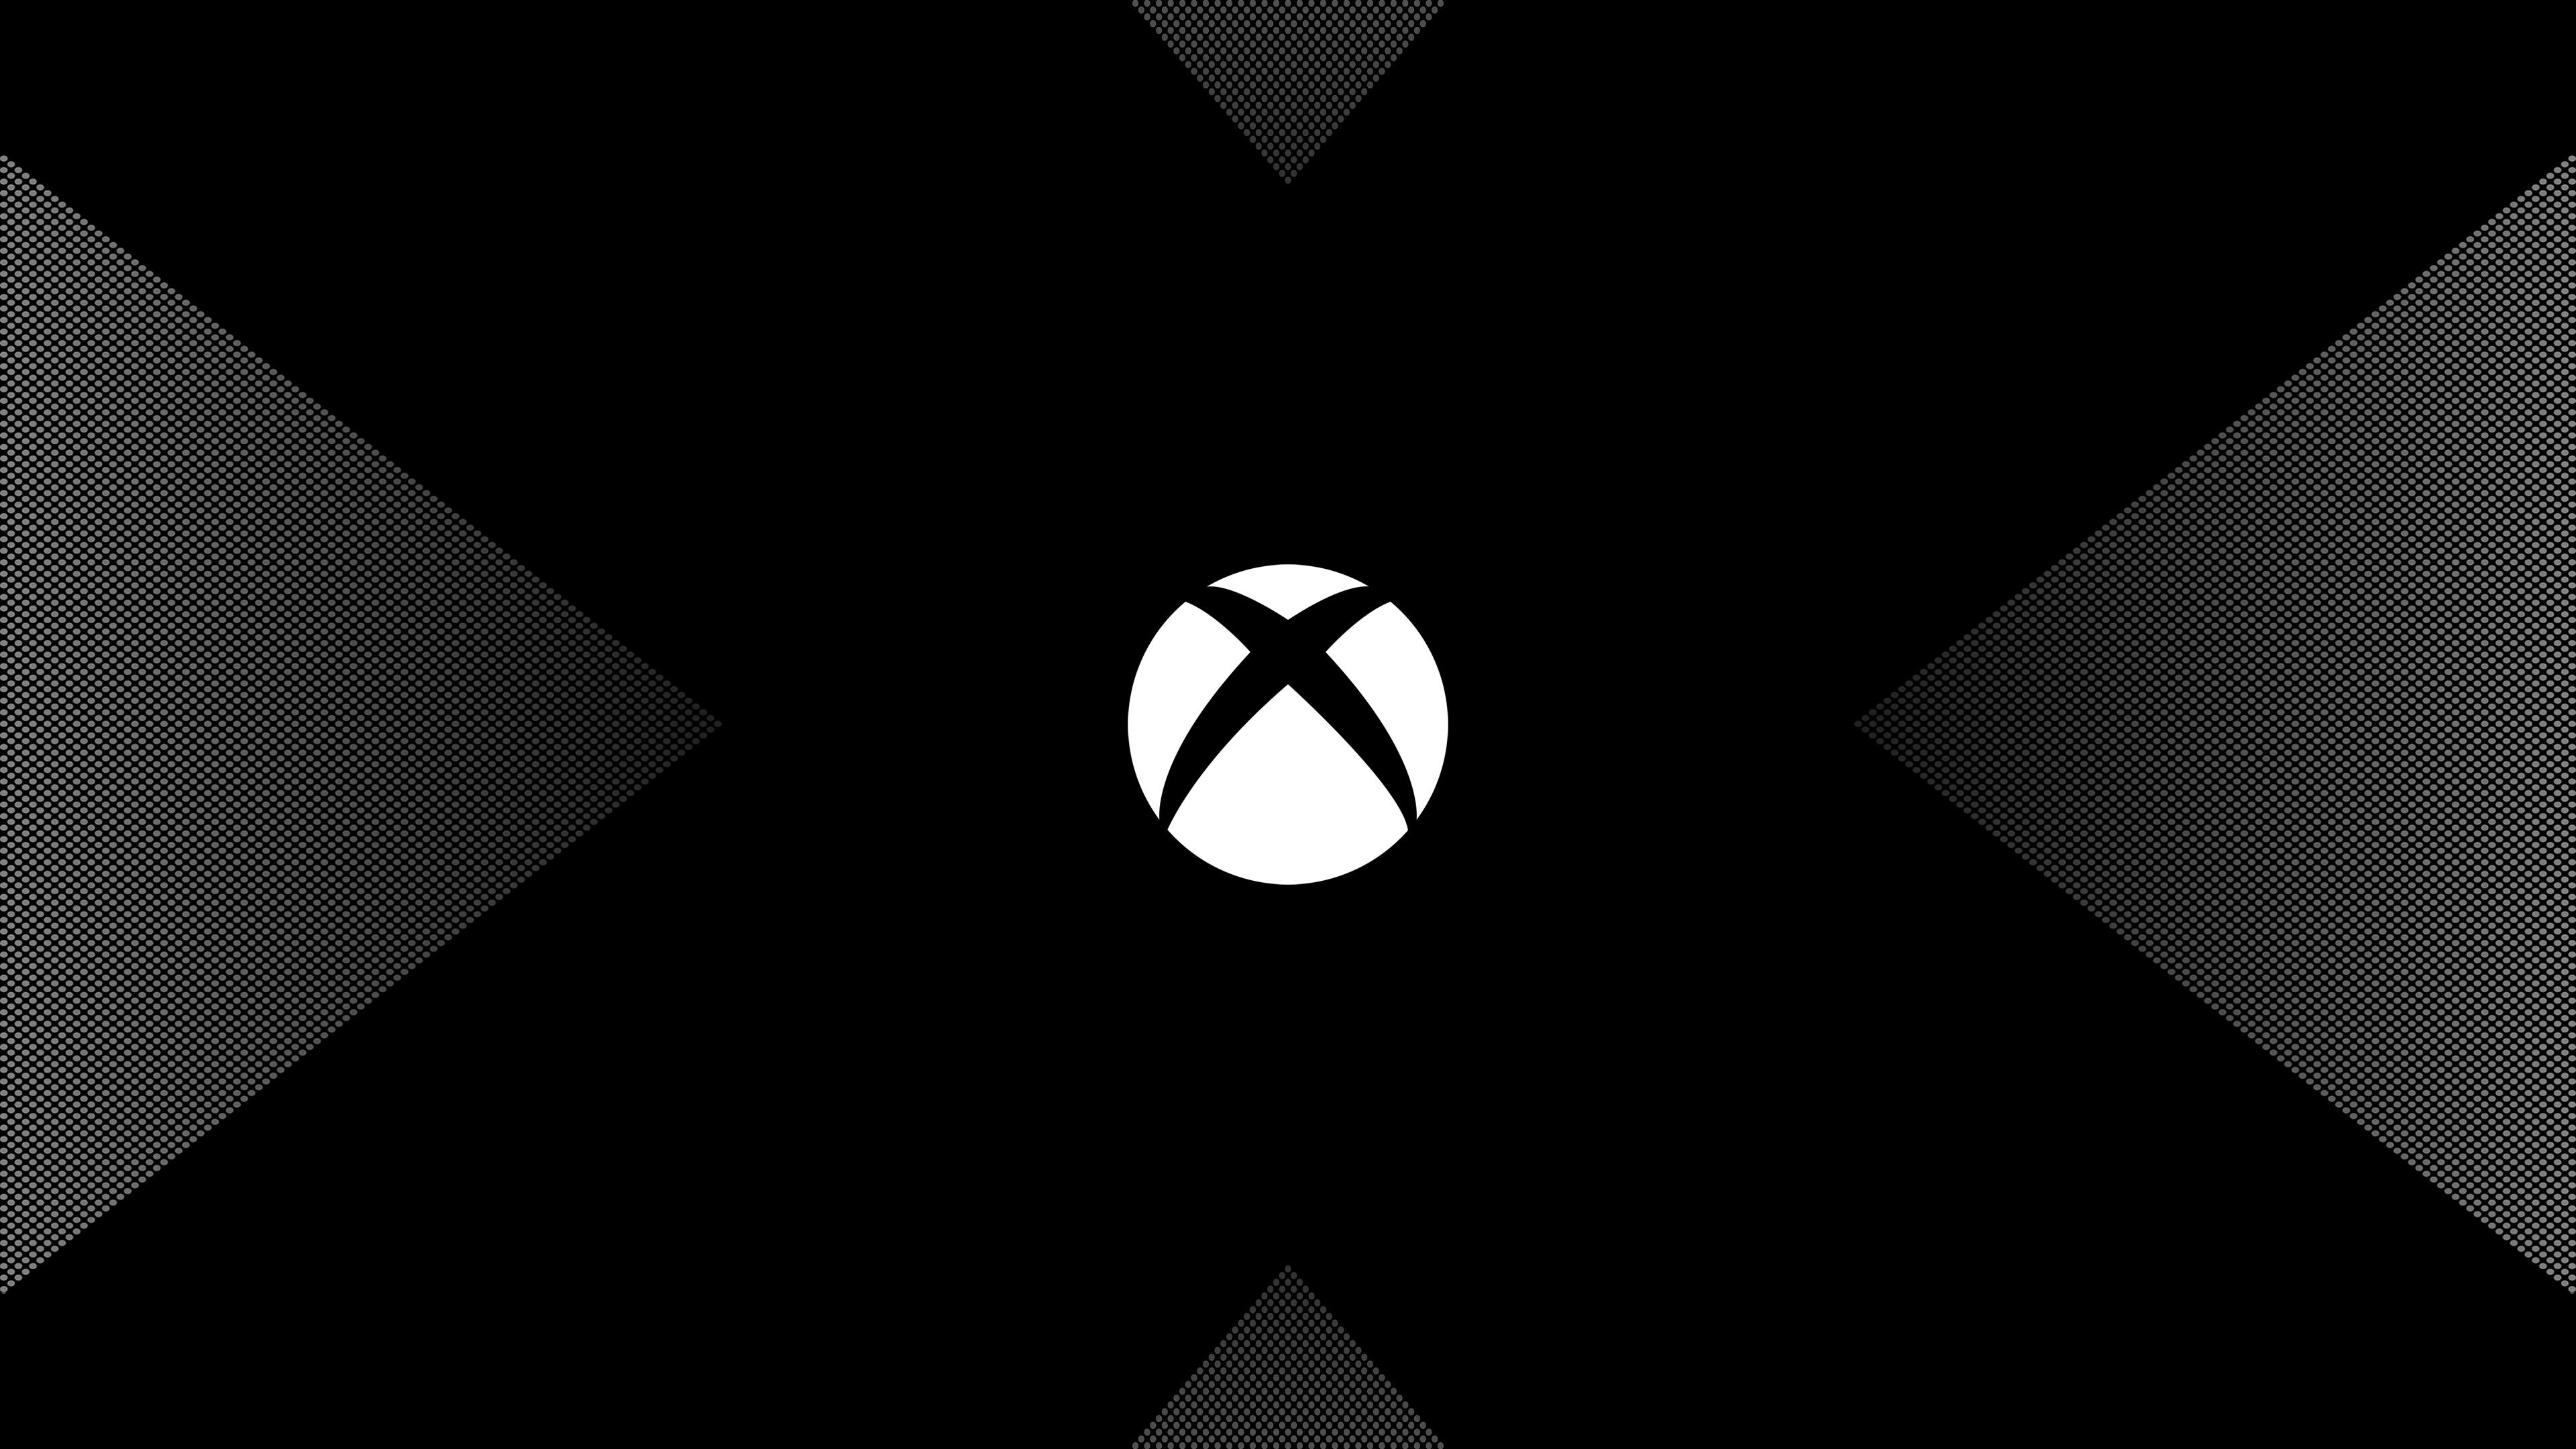 Xbox один х логотип обои скачать